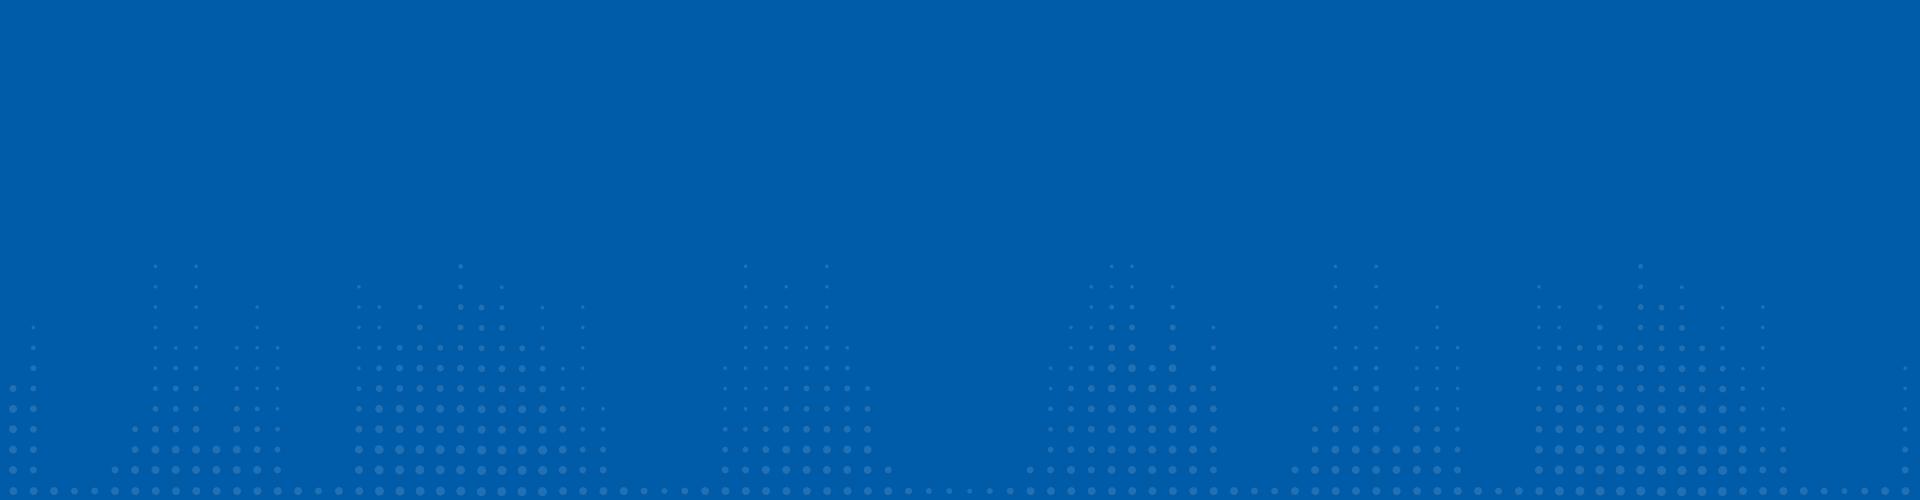 blue_background_1920x500